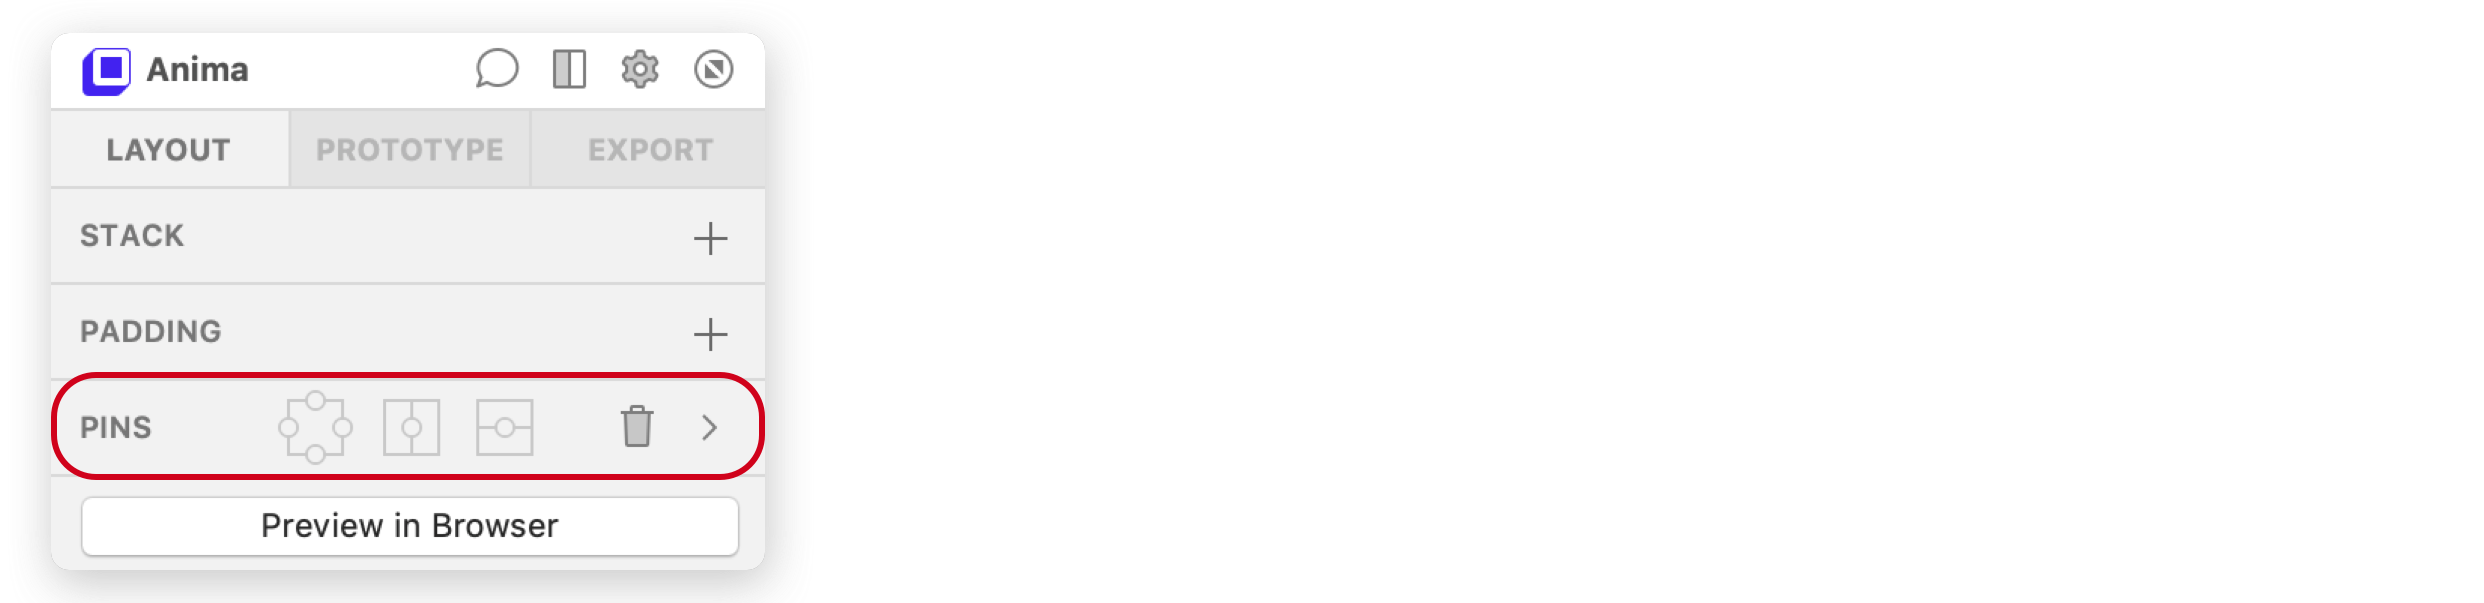 Basic Pins Panel